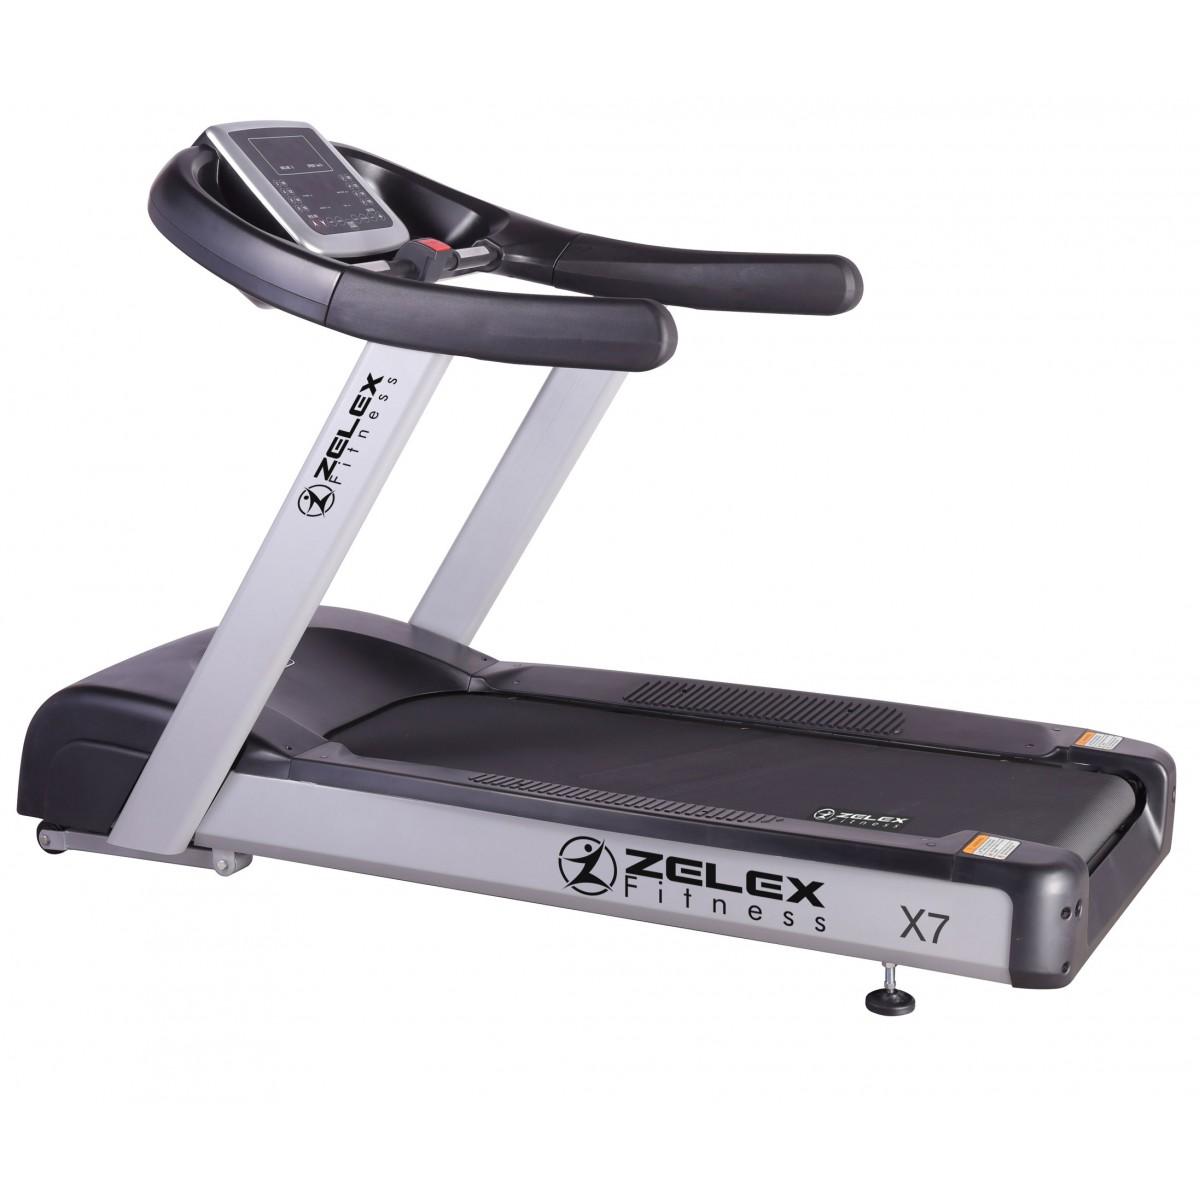 Worn Treadmill Deck: Zelex Fitness